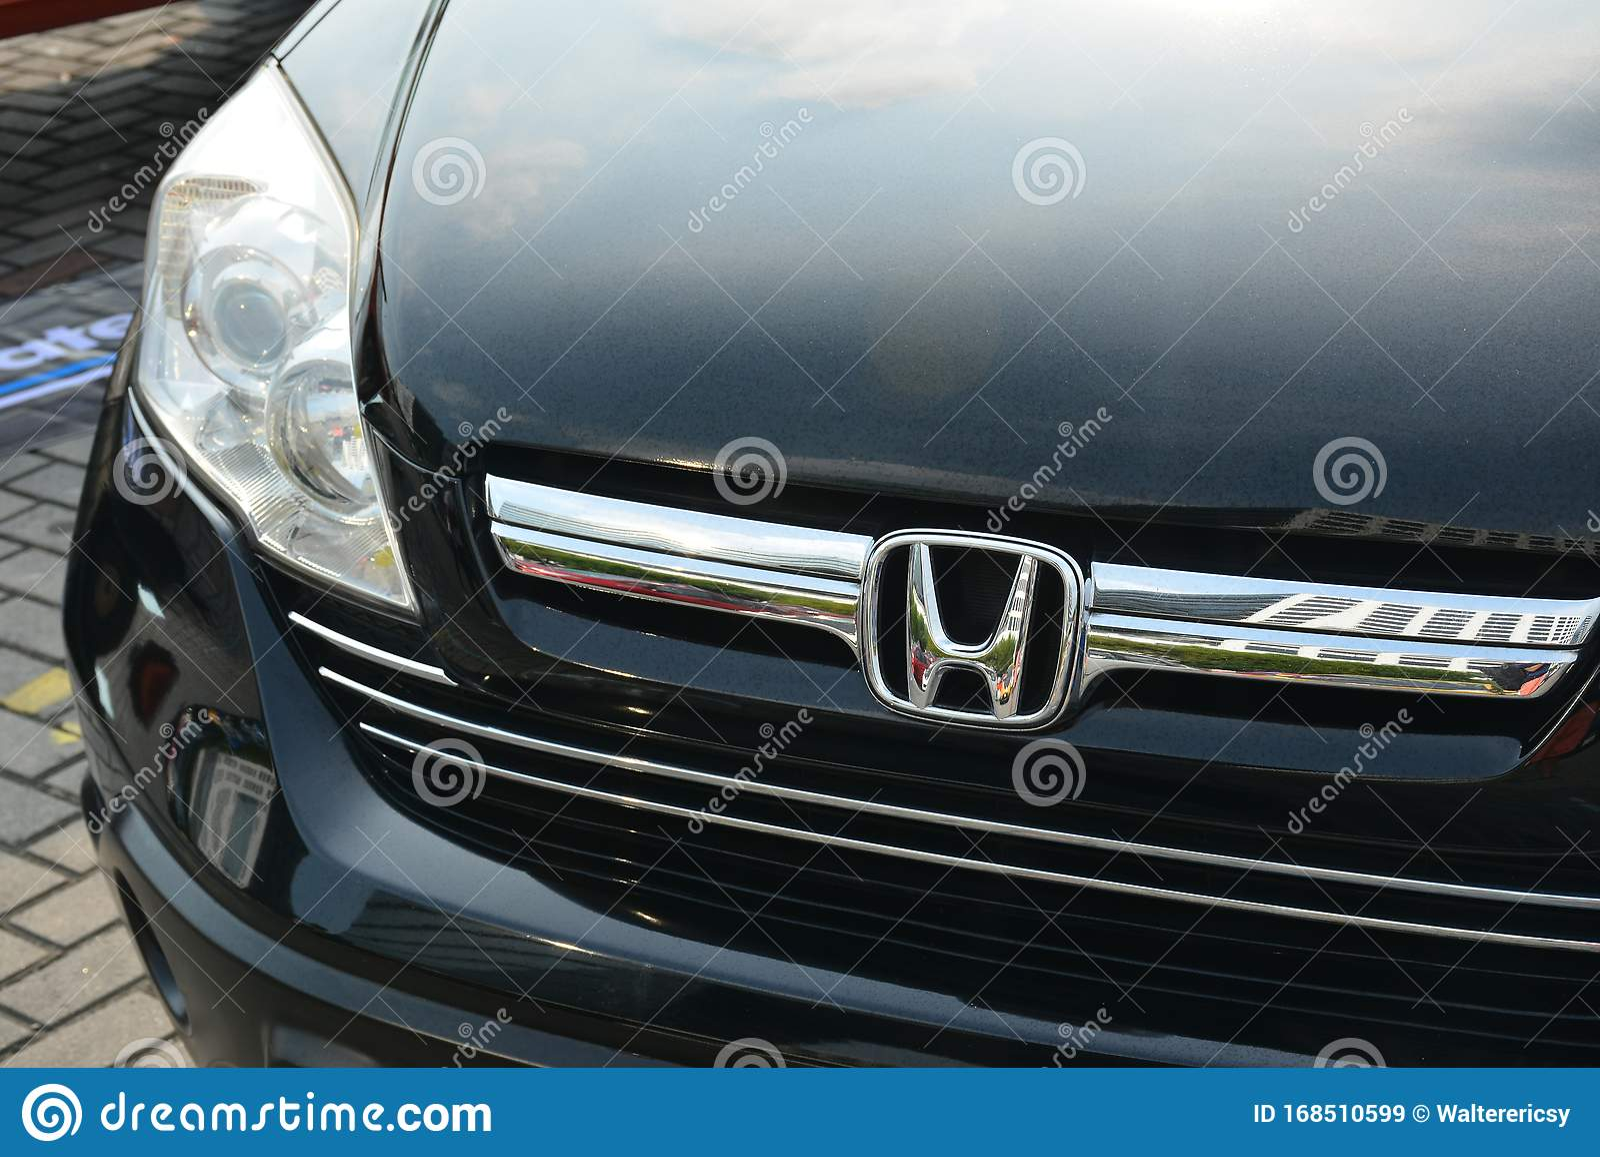 Honda Crv Suv At Bumper To Bumper 15 Car Show Editorial Stock Image Image Of Market Modified 168510599